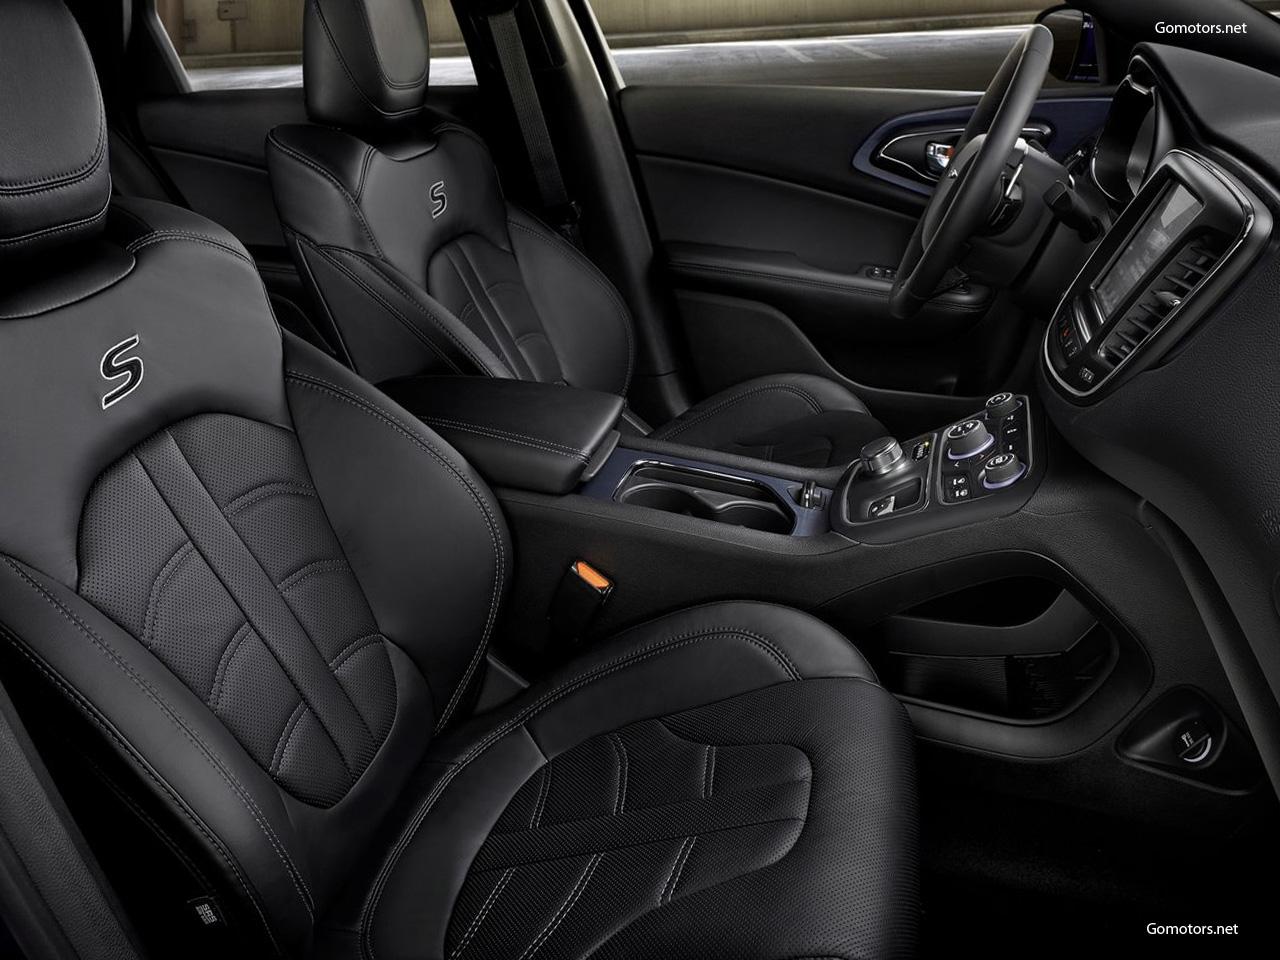 2015 Chrysler 200 Interior Photos Reviews News Specs